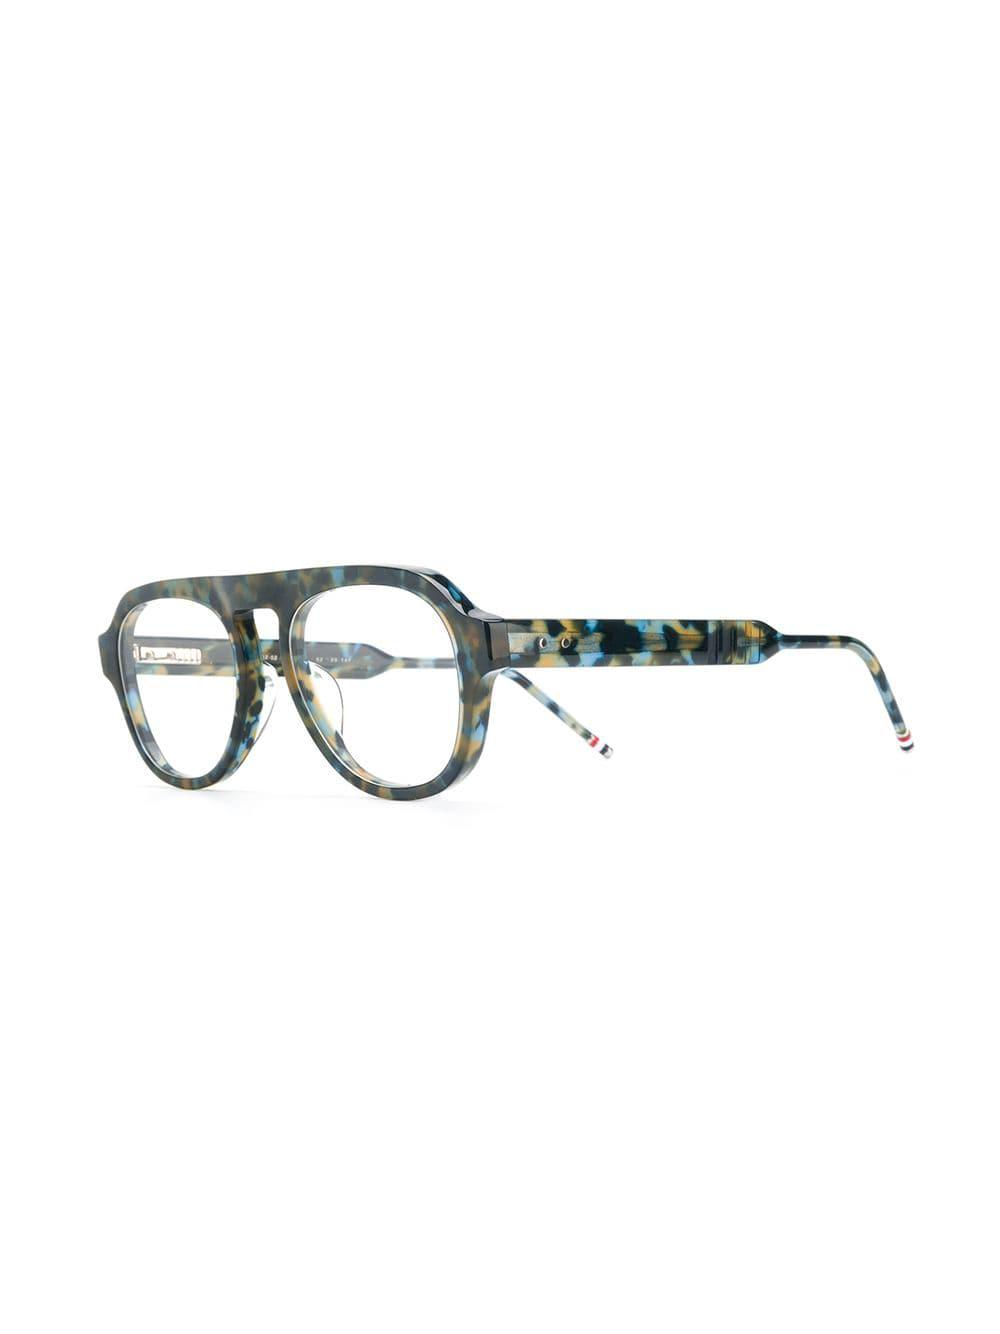 2218ae316bd0 Thom Browne Navy Tortoise Glasses in Blue for Men - Lyst